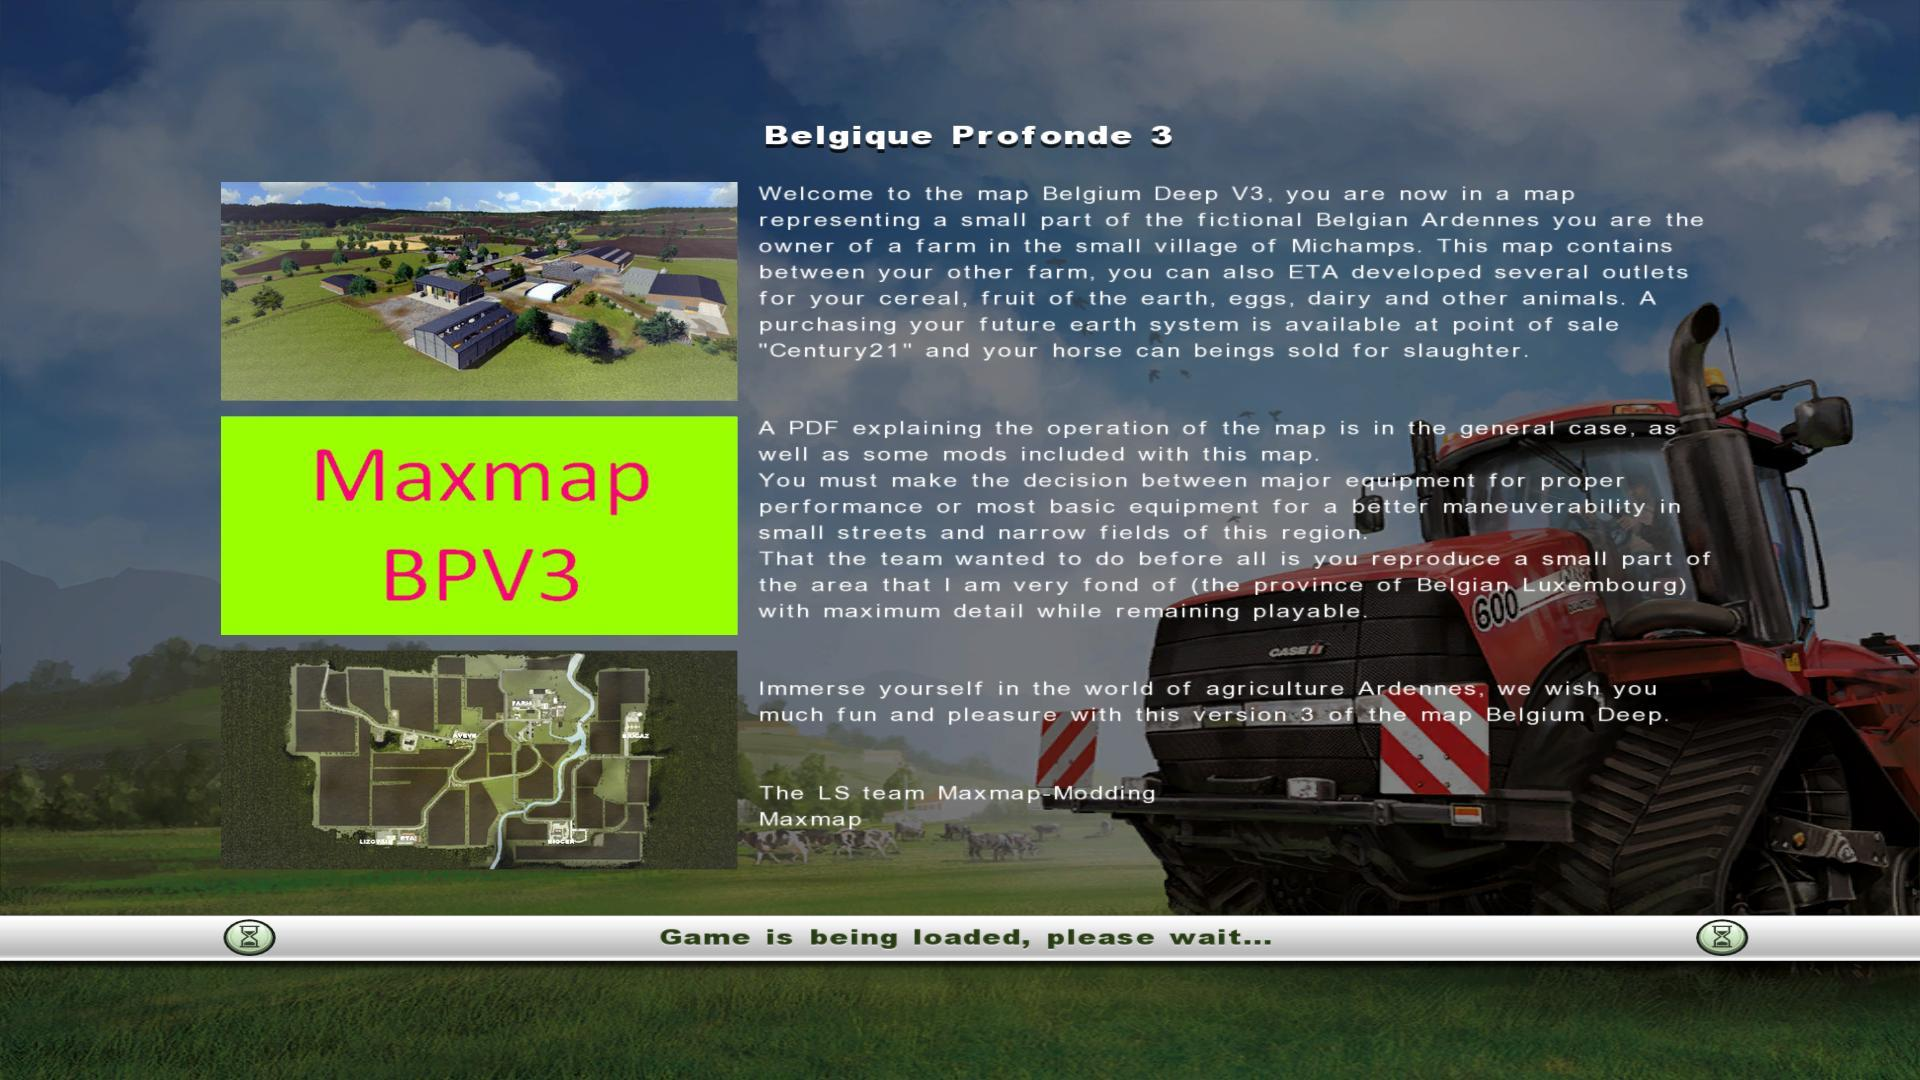 luxfarm ls modding belgique profonde v3 tracteur routier occasion renault. Black Bedroom Furniture Sets. Home Design Ideas